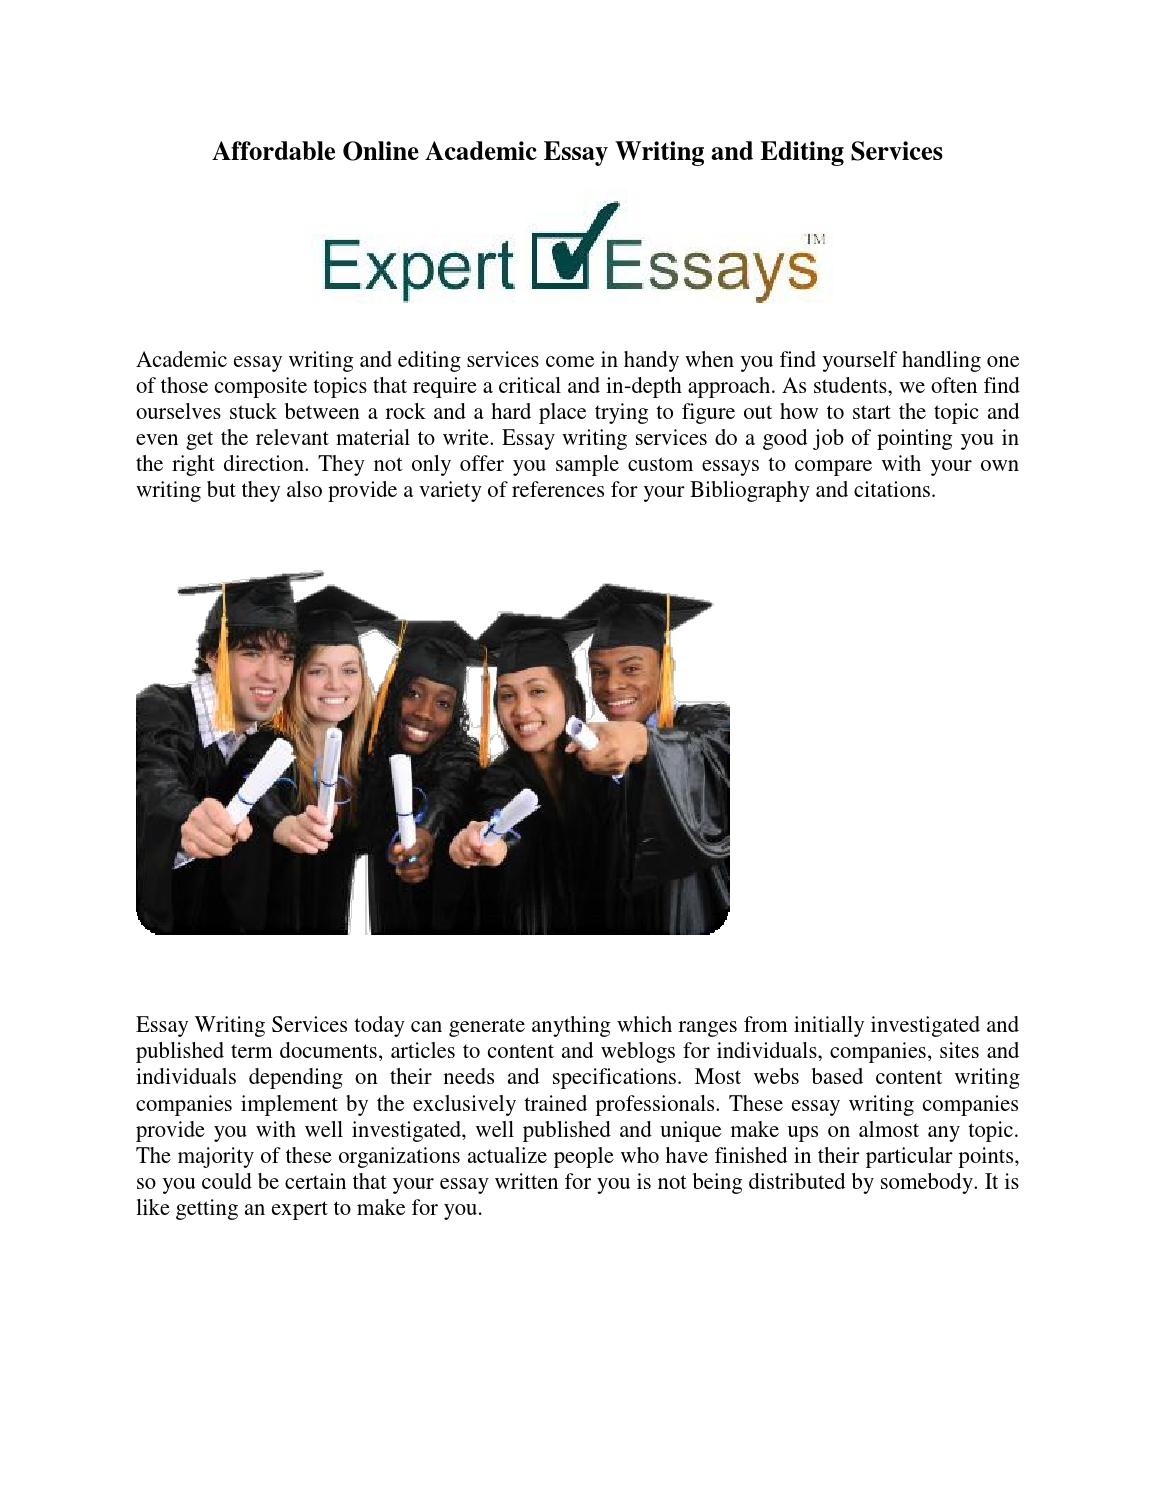 Essay writing companies compare